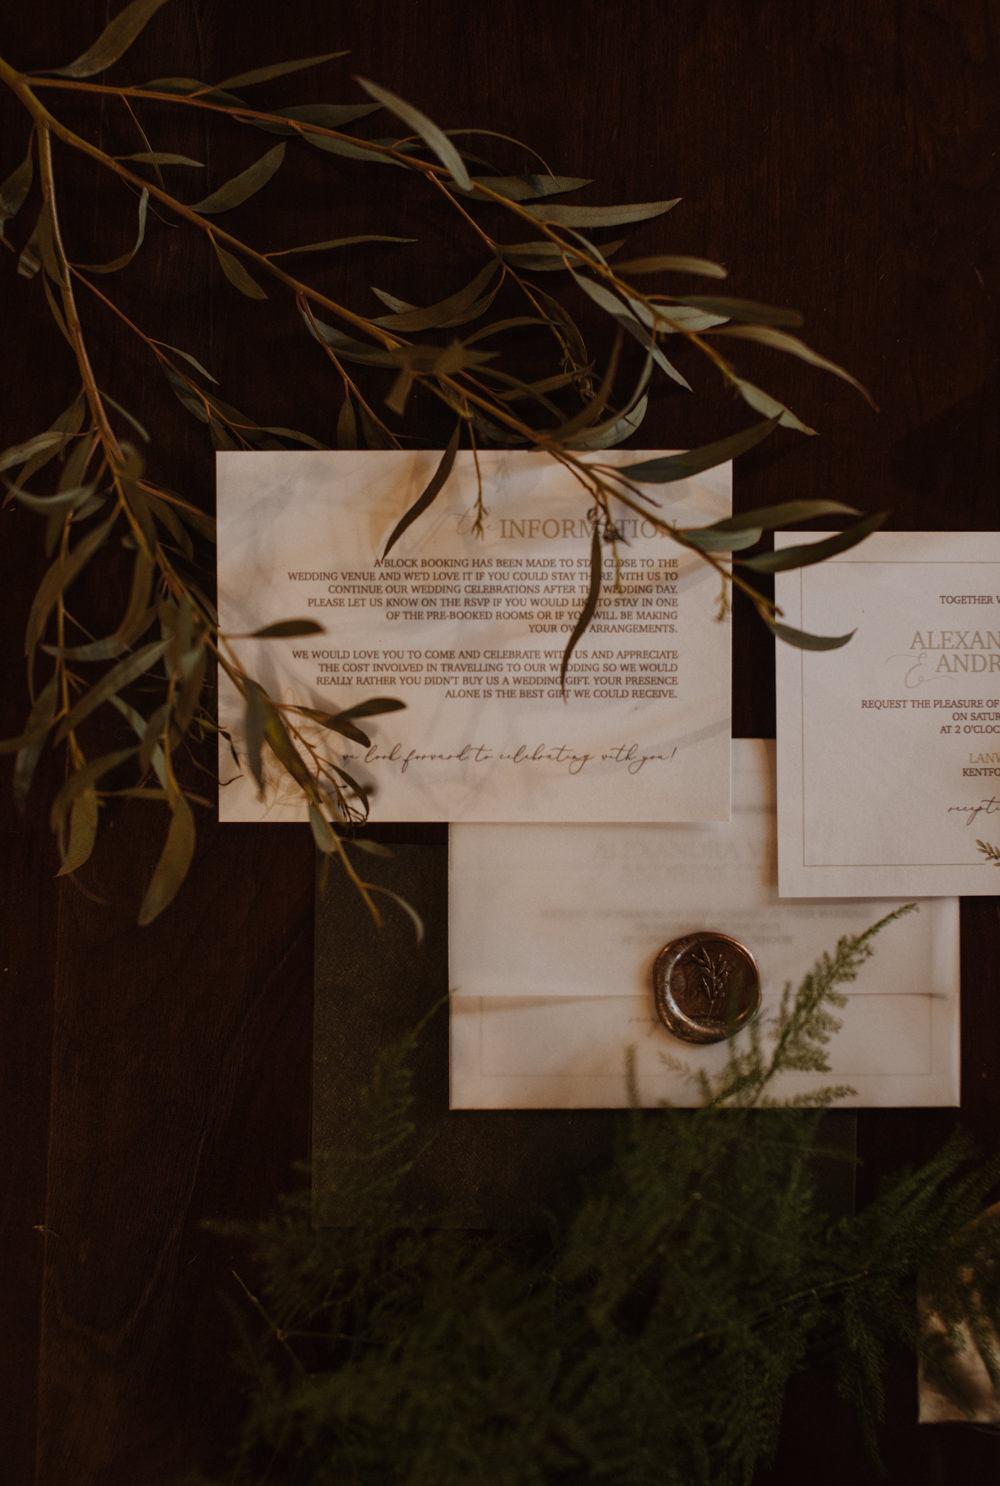 Greenery Foliage Stationery Wax Seal Olive Branch Fern Organic Foliage Wedding Ideas Rubie Love Photography